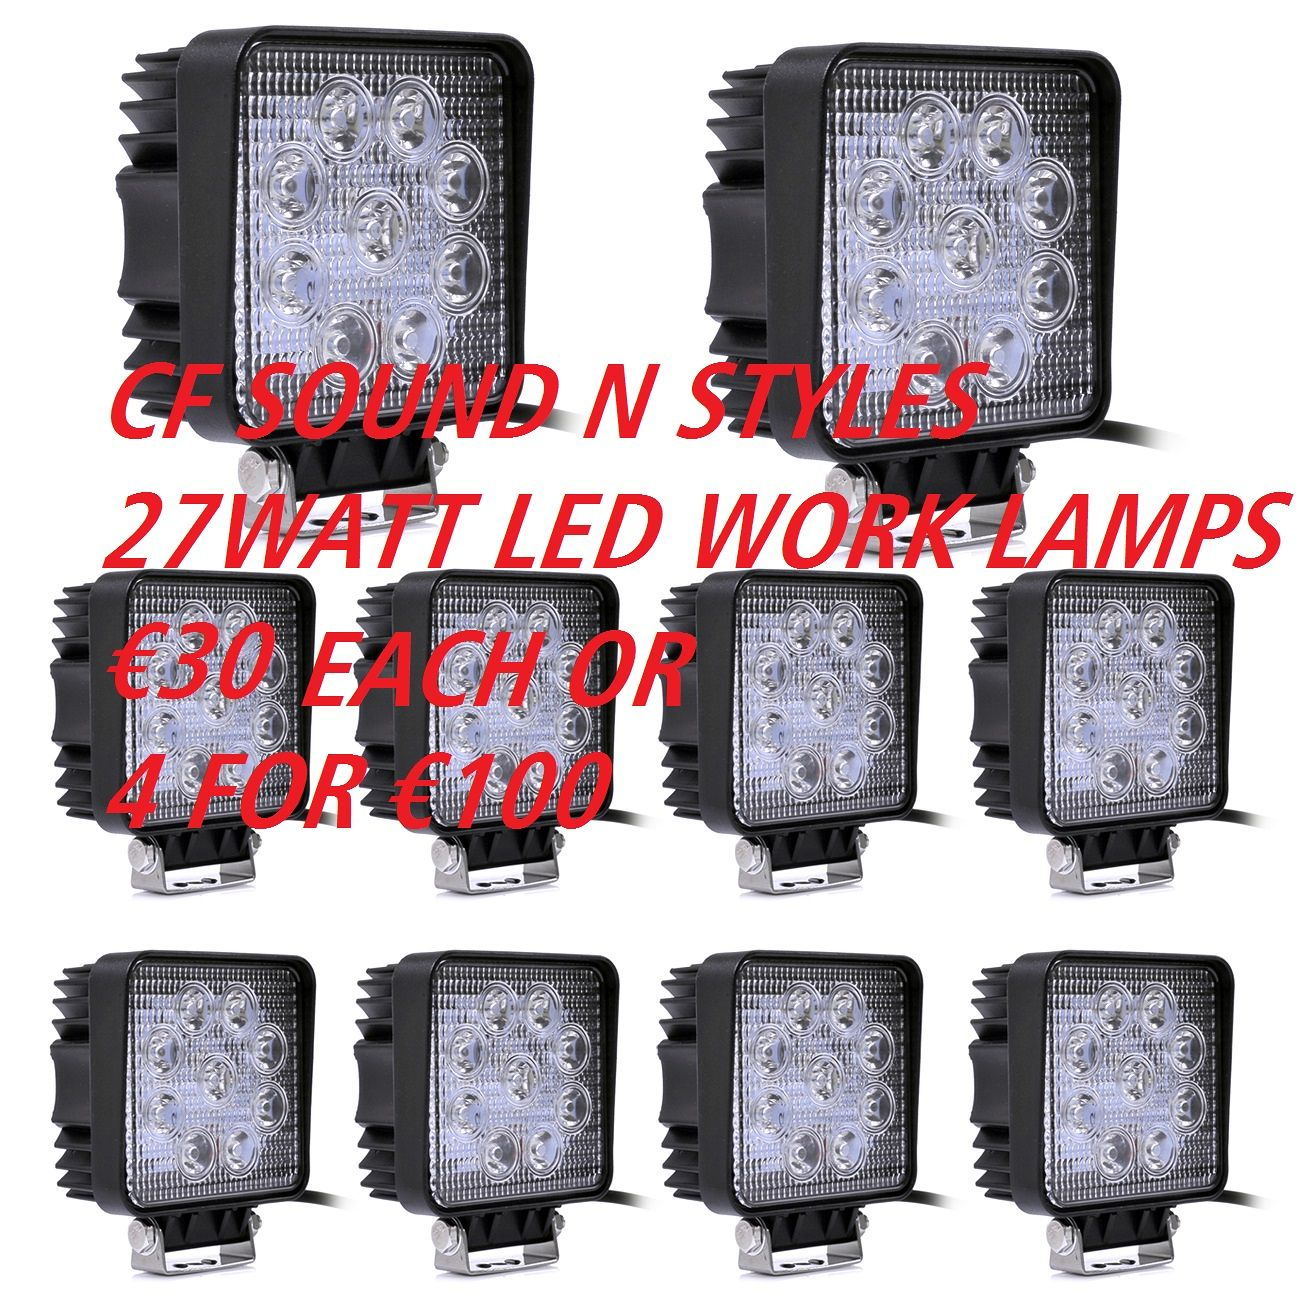 27 Watt Led High Power Cree Work Lamp Light 12 Amp 24 Volt